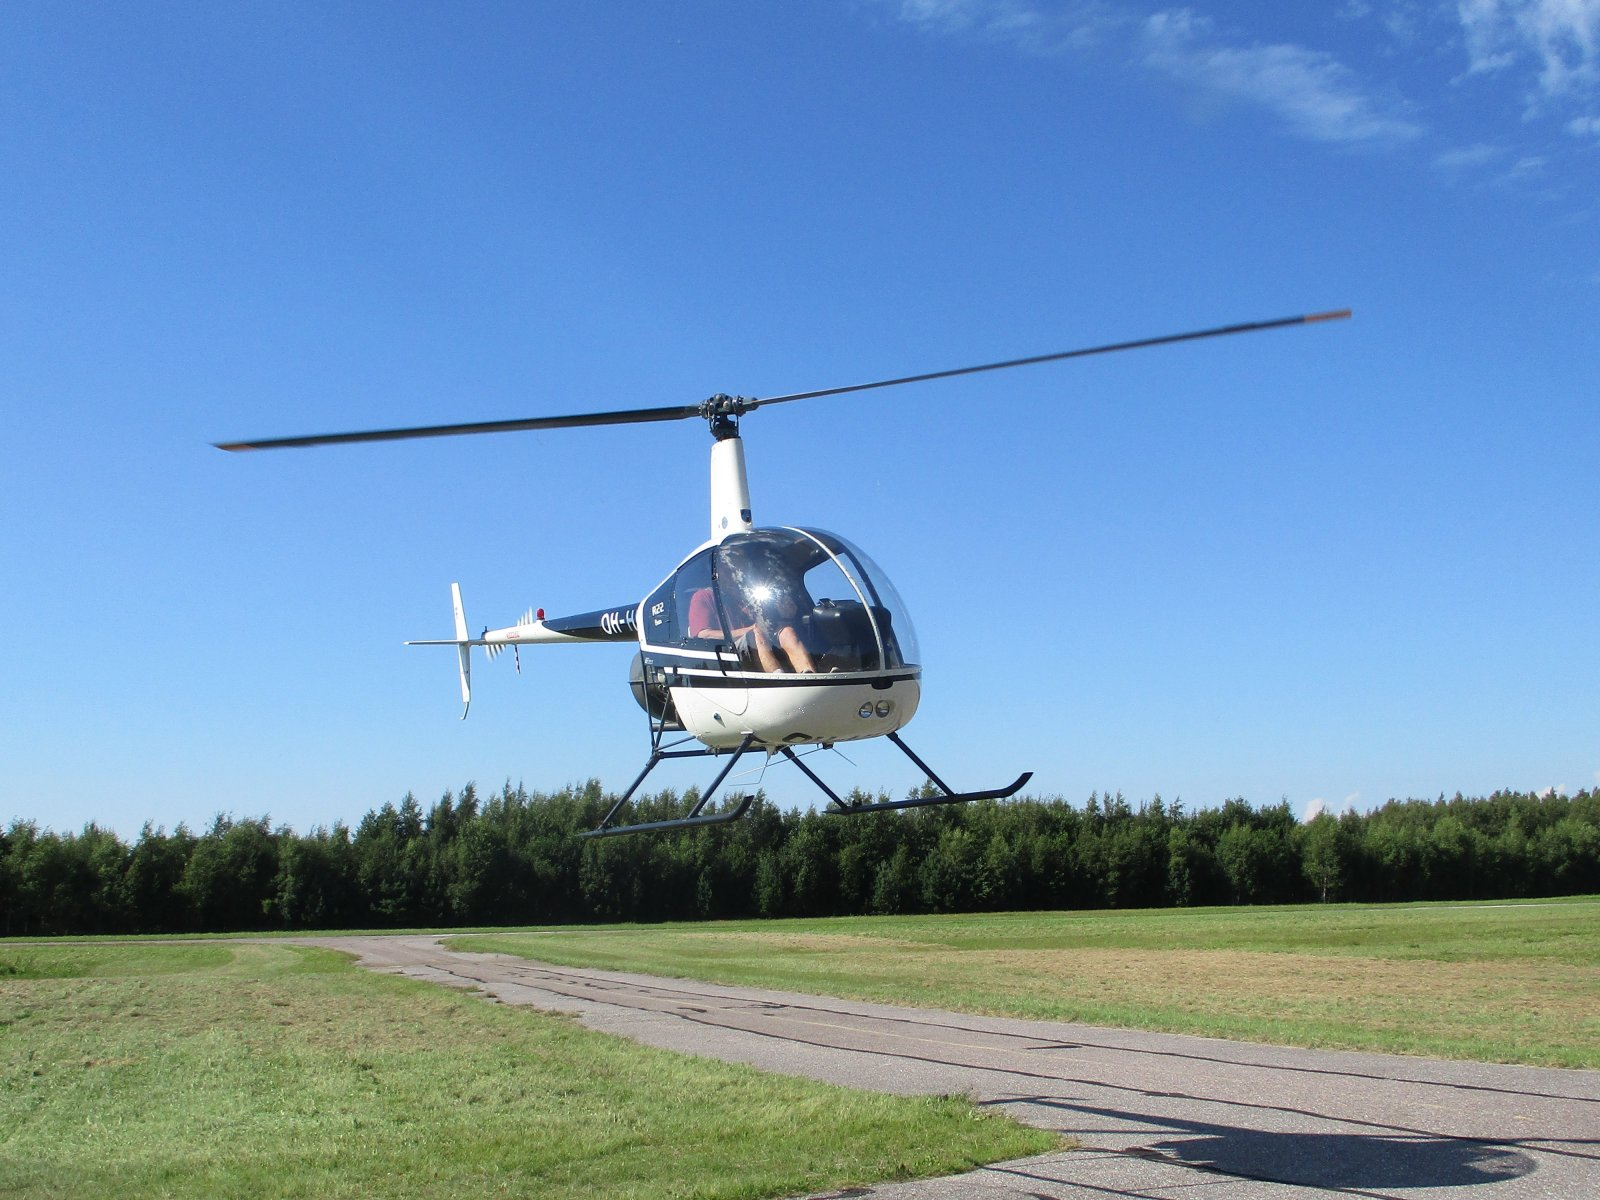 Robinson R22 Beta OH-HKP EFHN 2020-08-09